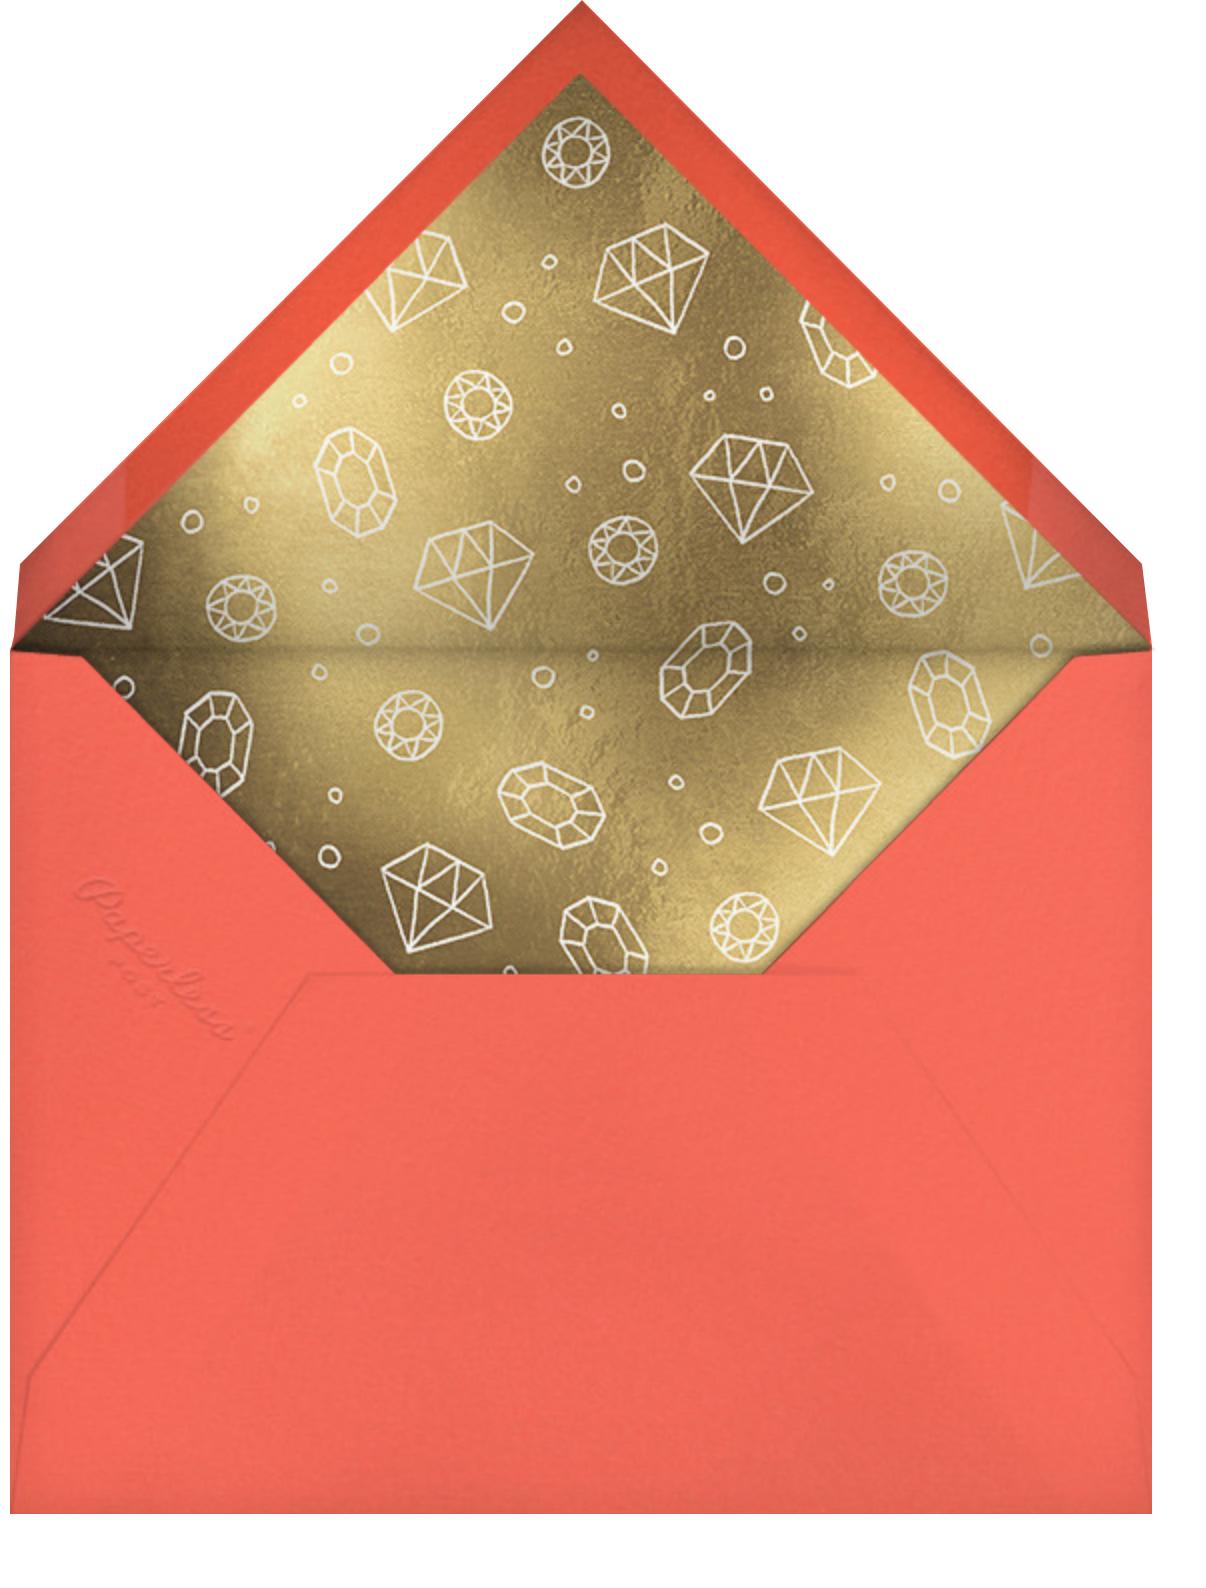 Davy Jones' Locker - Paperless Post - Kids' birthday - envelope back